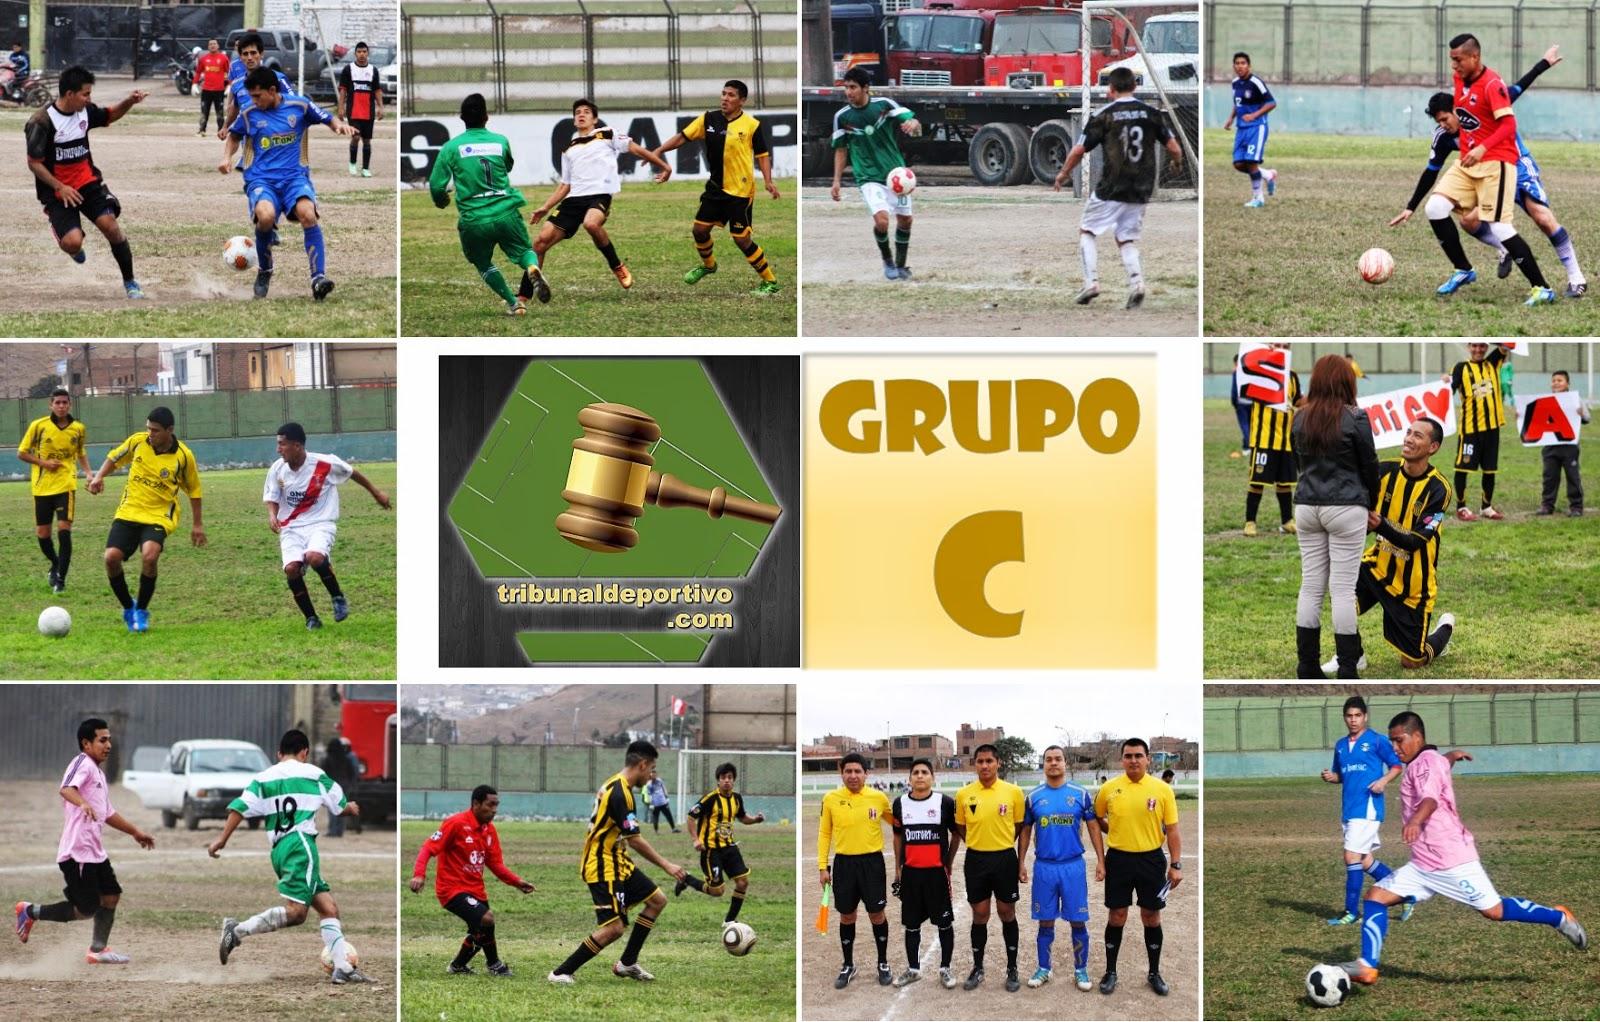 http://tribunal-deportivo.blogspot.com/2014/09/departamental-callao-1-fase-grupo-c.html